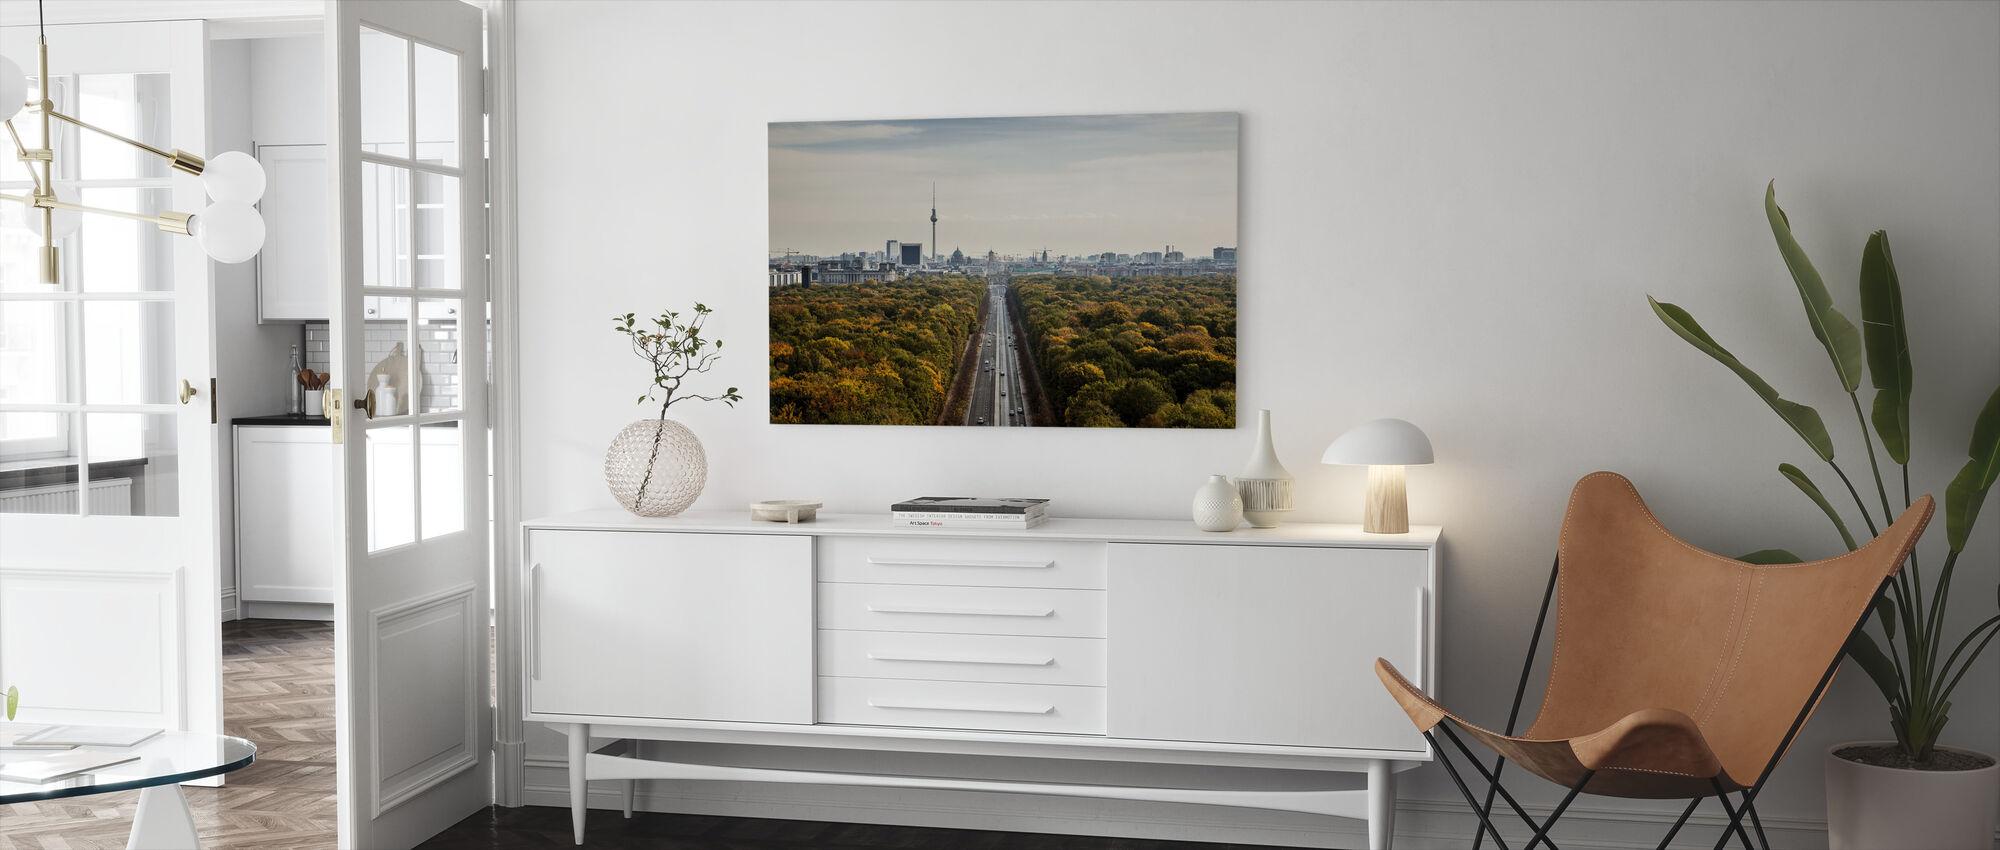 Tiergatan, Berlin - Canvas print - Living Room